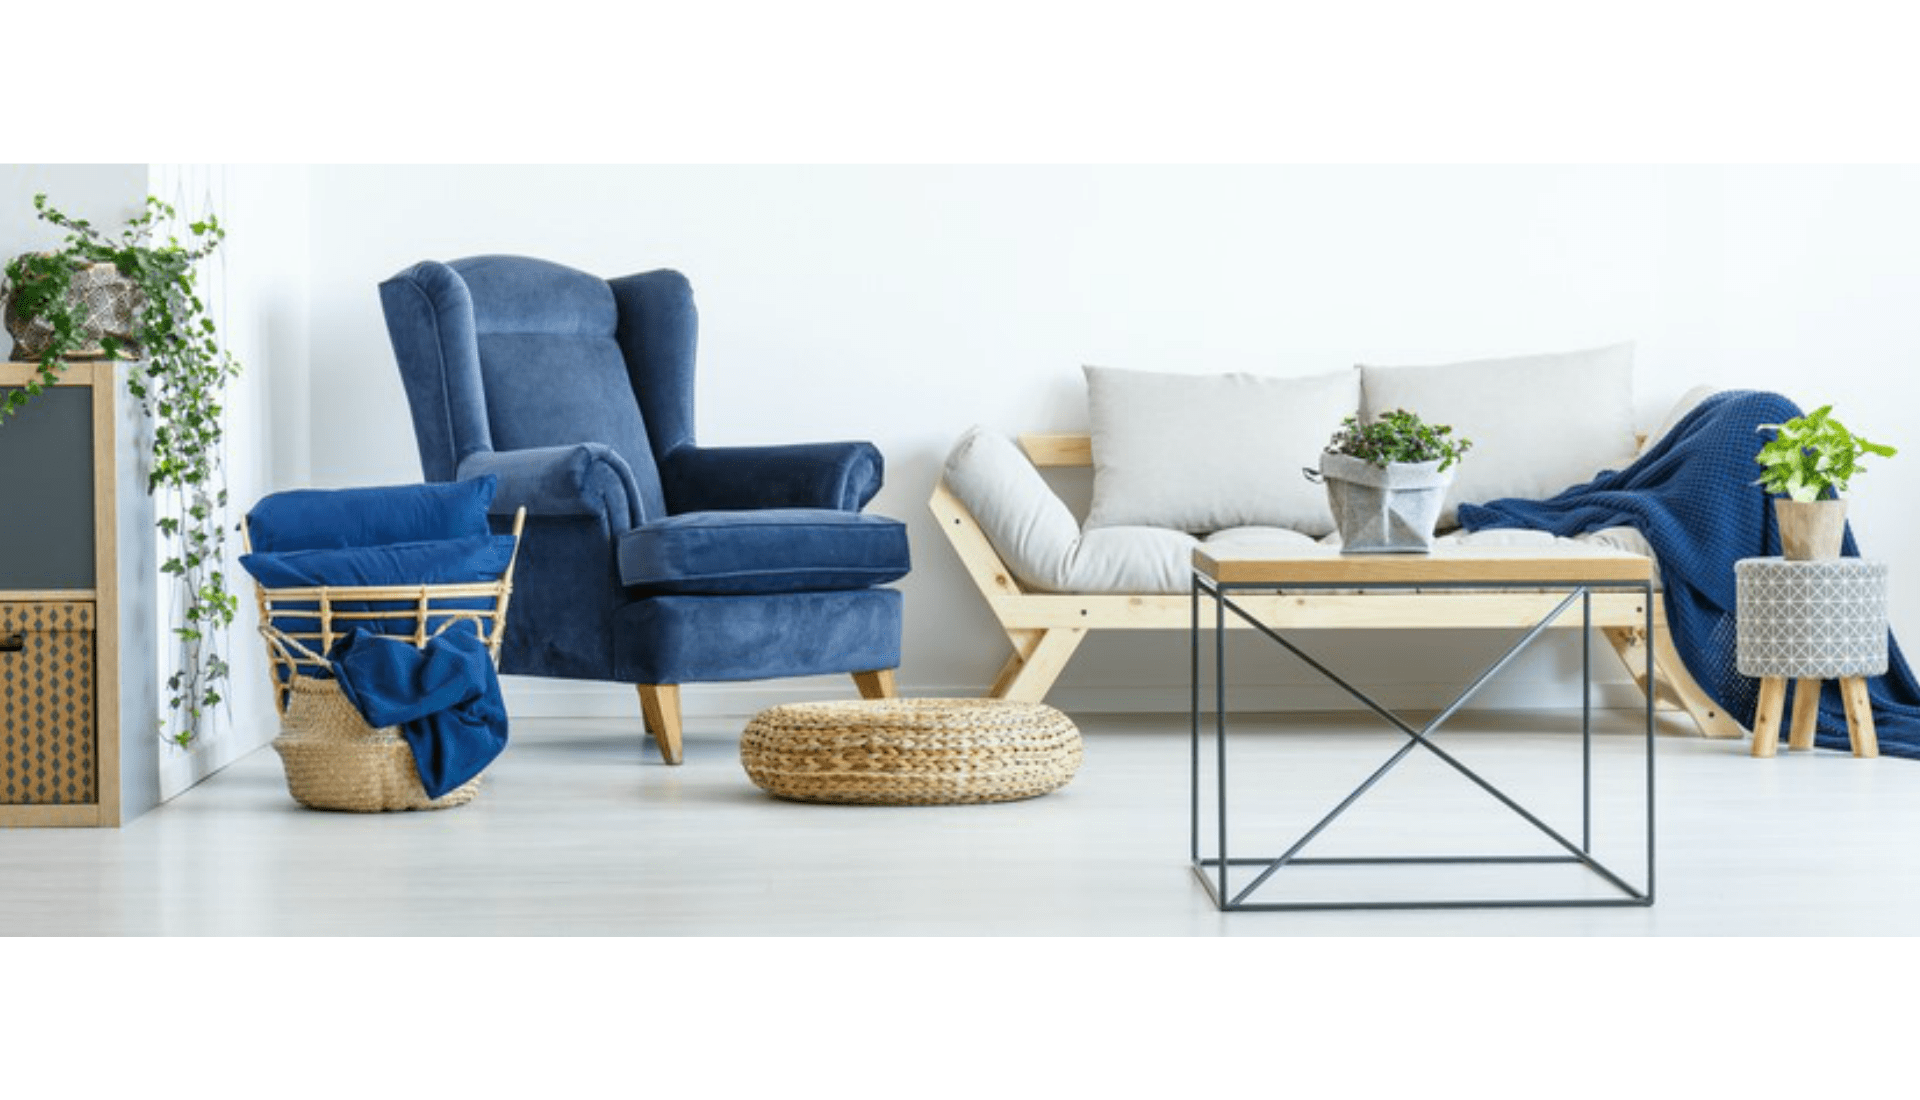 2018 Decor and Design Trends